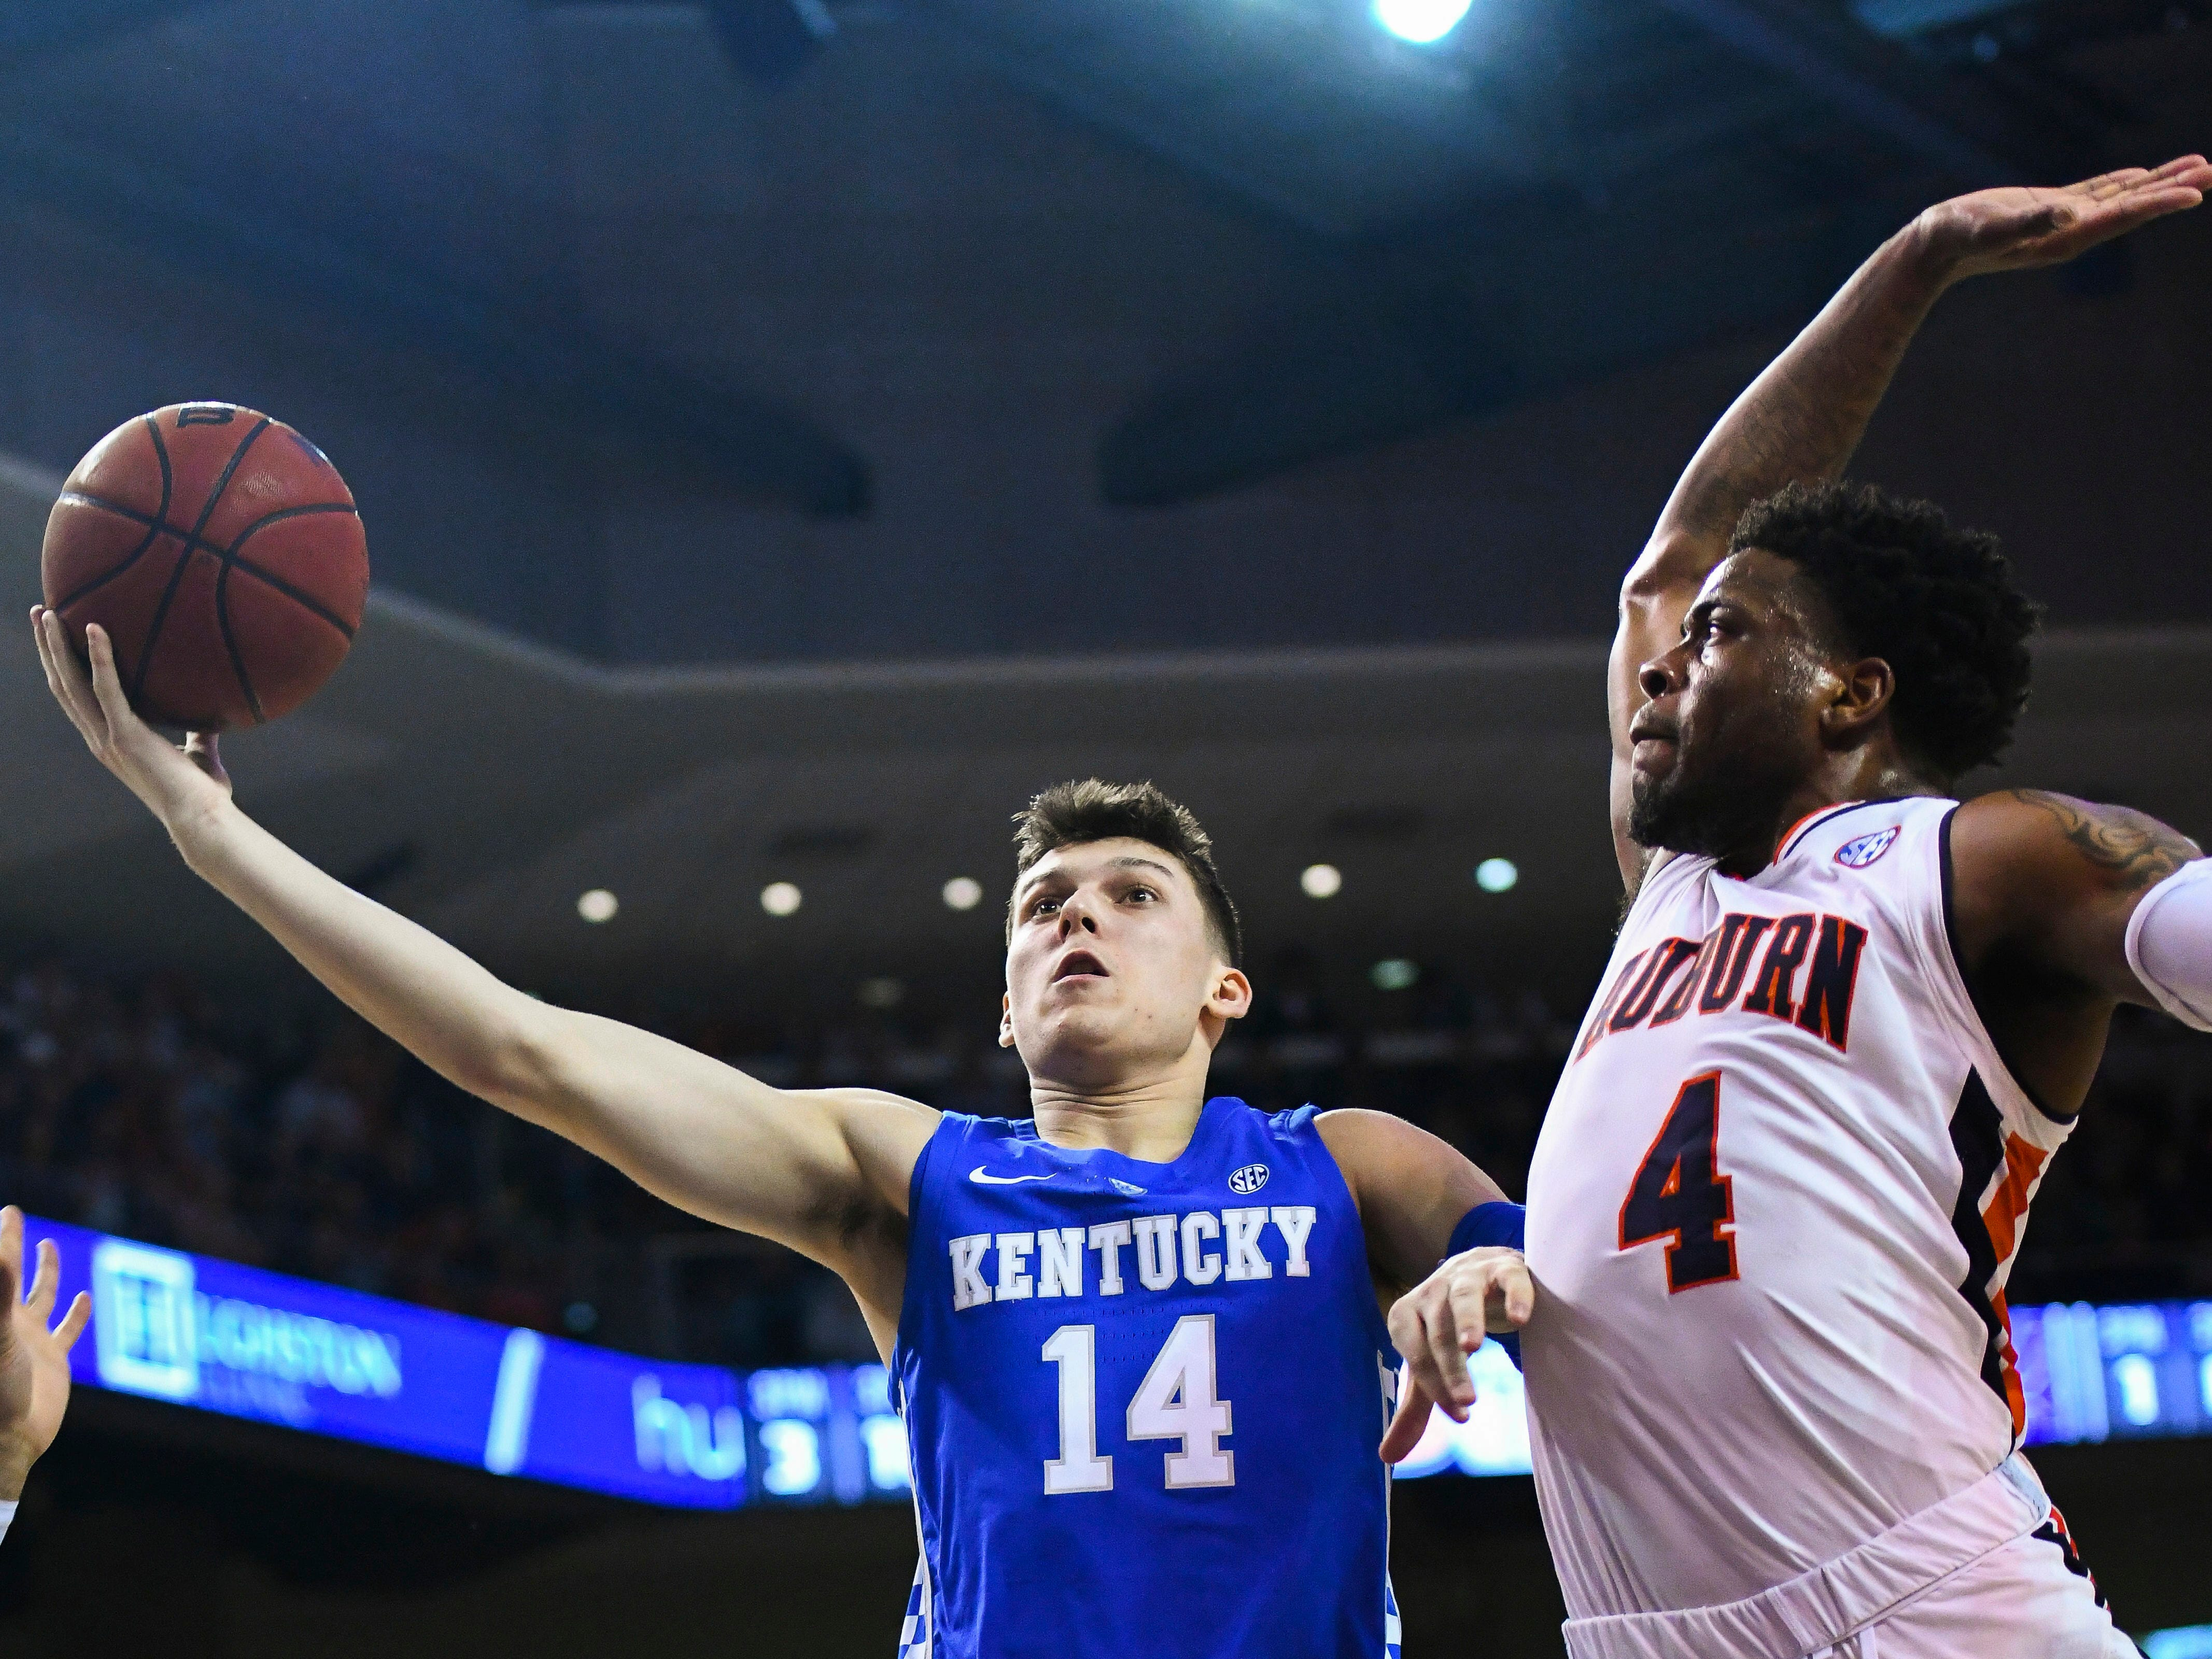 Kentucky basketball vs. Auburn: How to watch, stream or listen